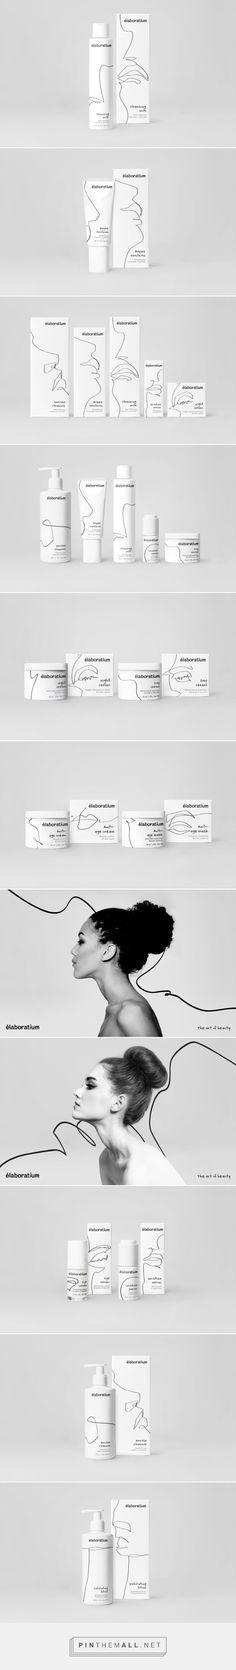 Elaboratium skin care (concept) packaging design by fb.com/steve.solodkov - https://www.packagingoftheworld.com/2018/03/elaboratium.html